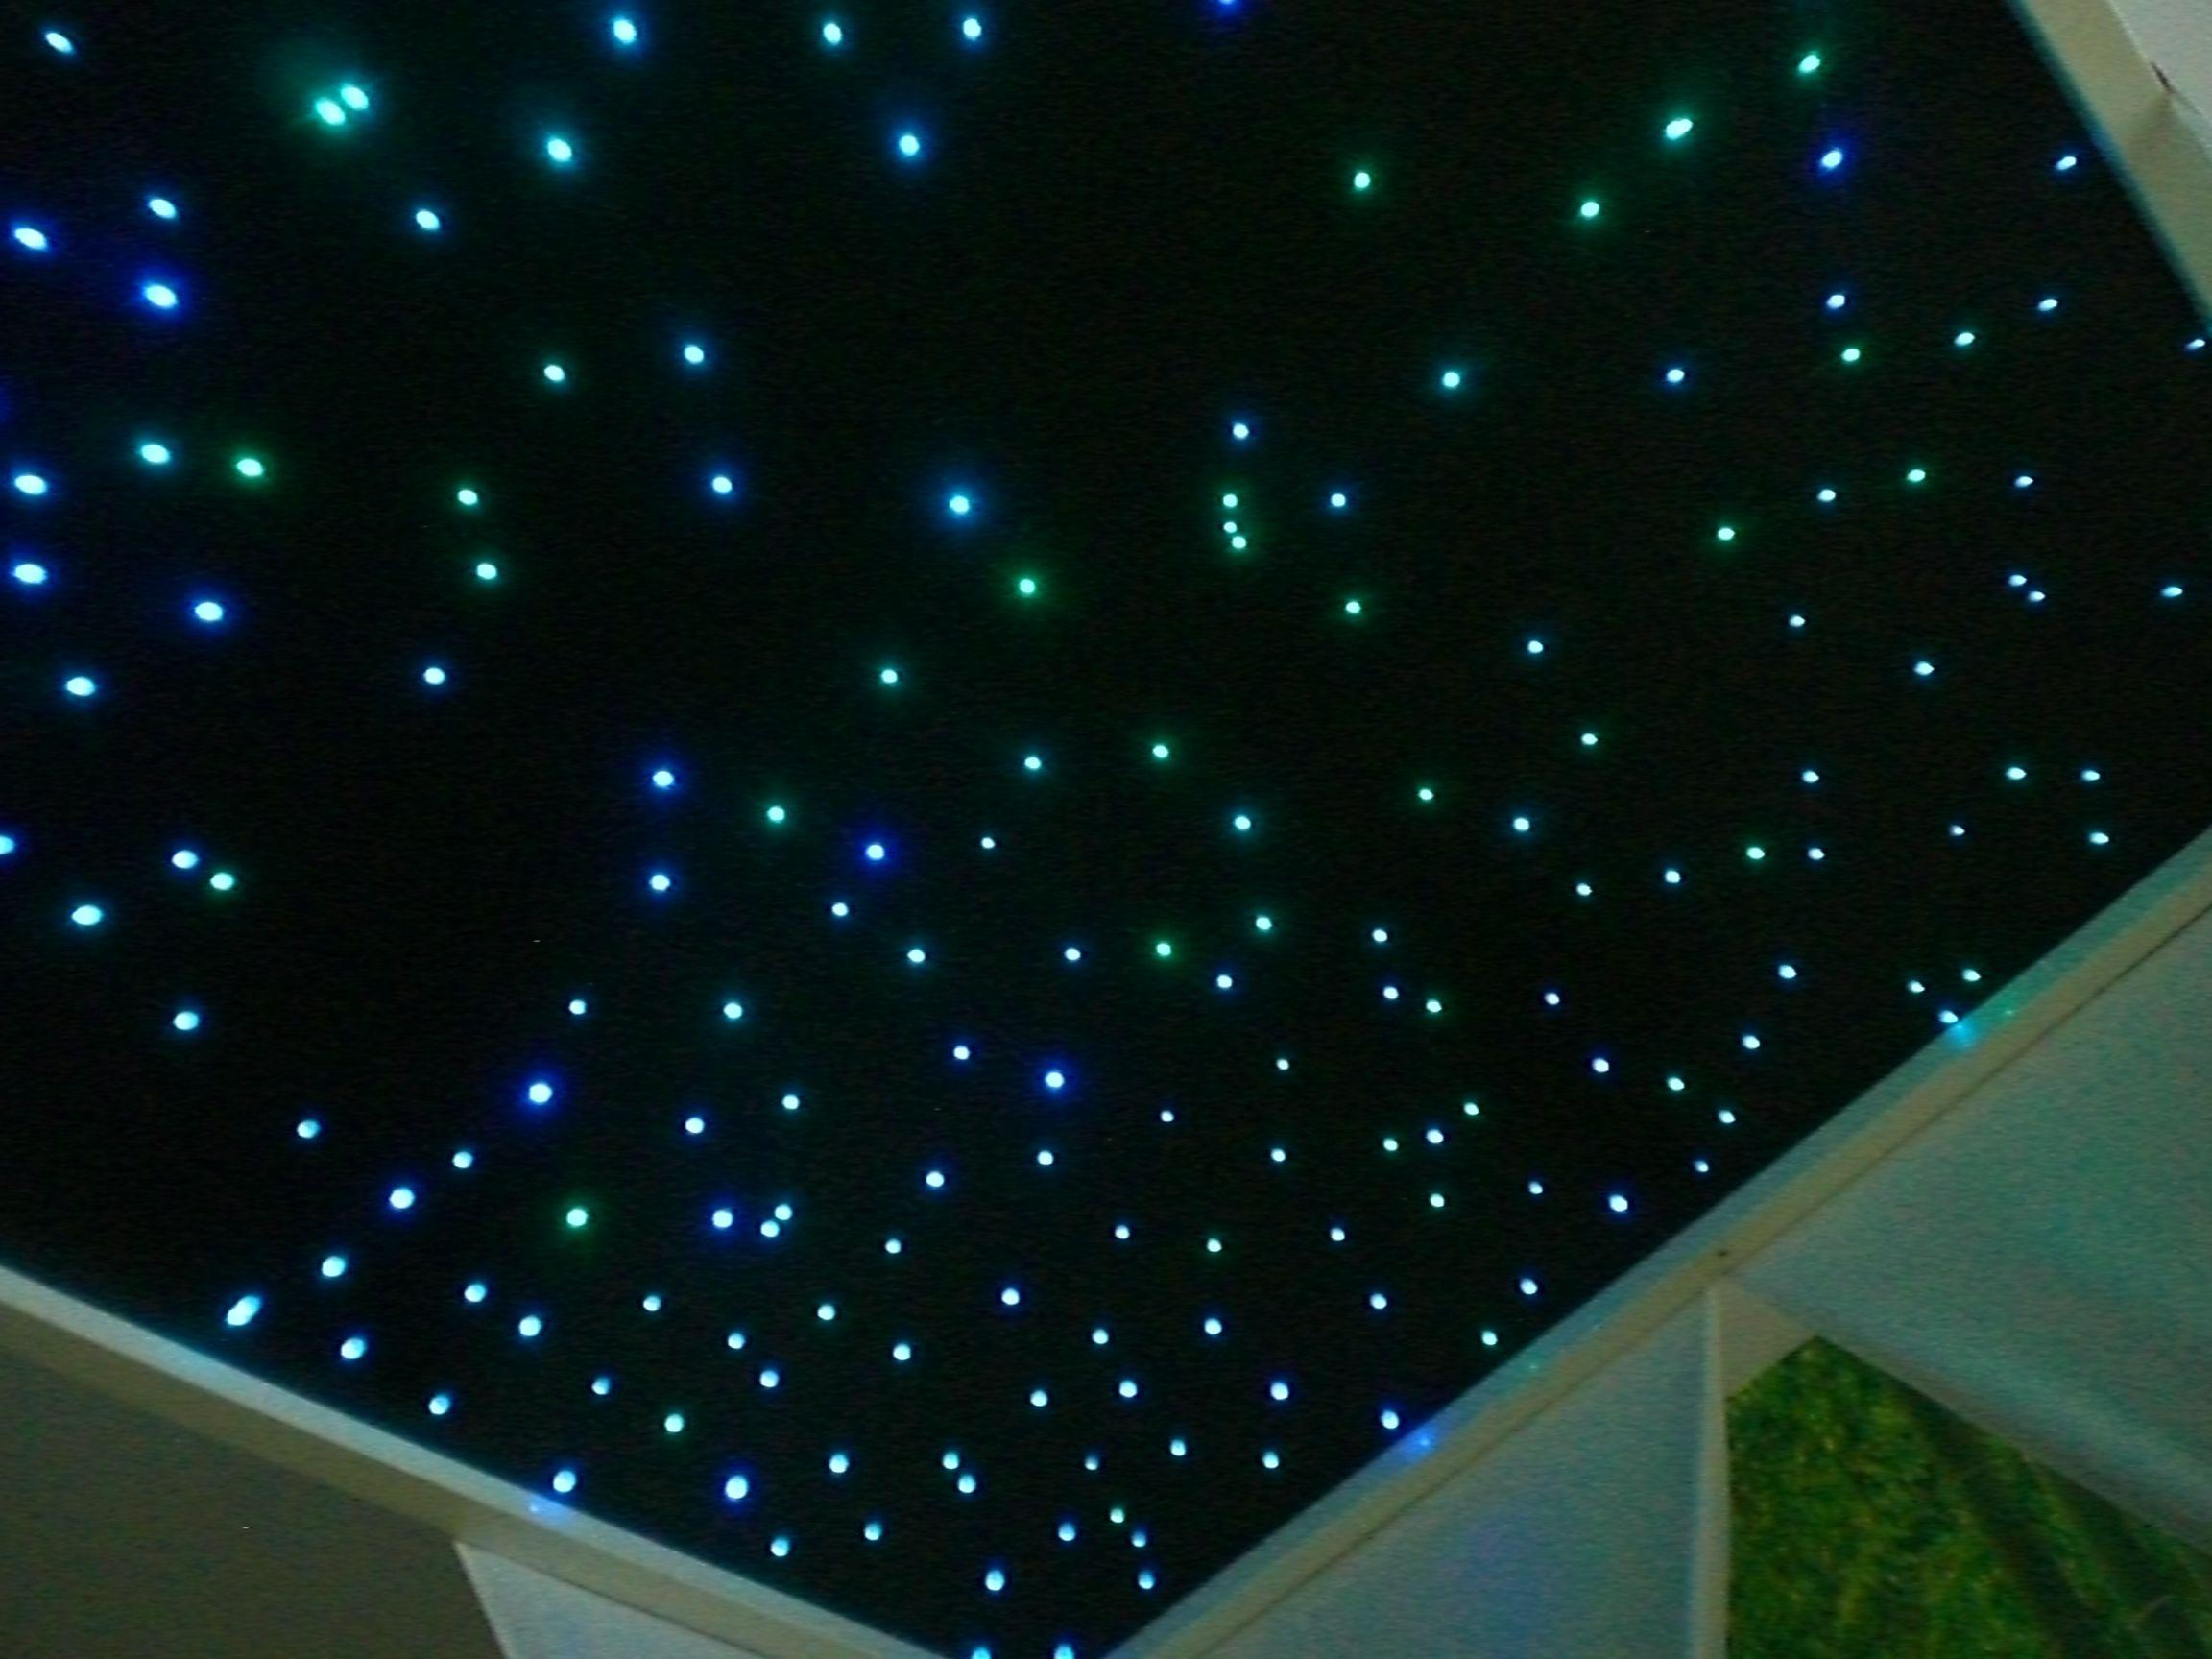 Full Size of Schlafzimmer Lampe Sternenhimmel Sofa Kinderzimmer Regal Weiß Regale Kinderzimmer Sternenhimmel Kinderzimmer